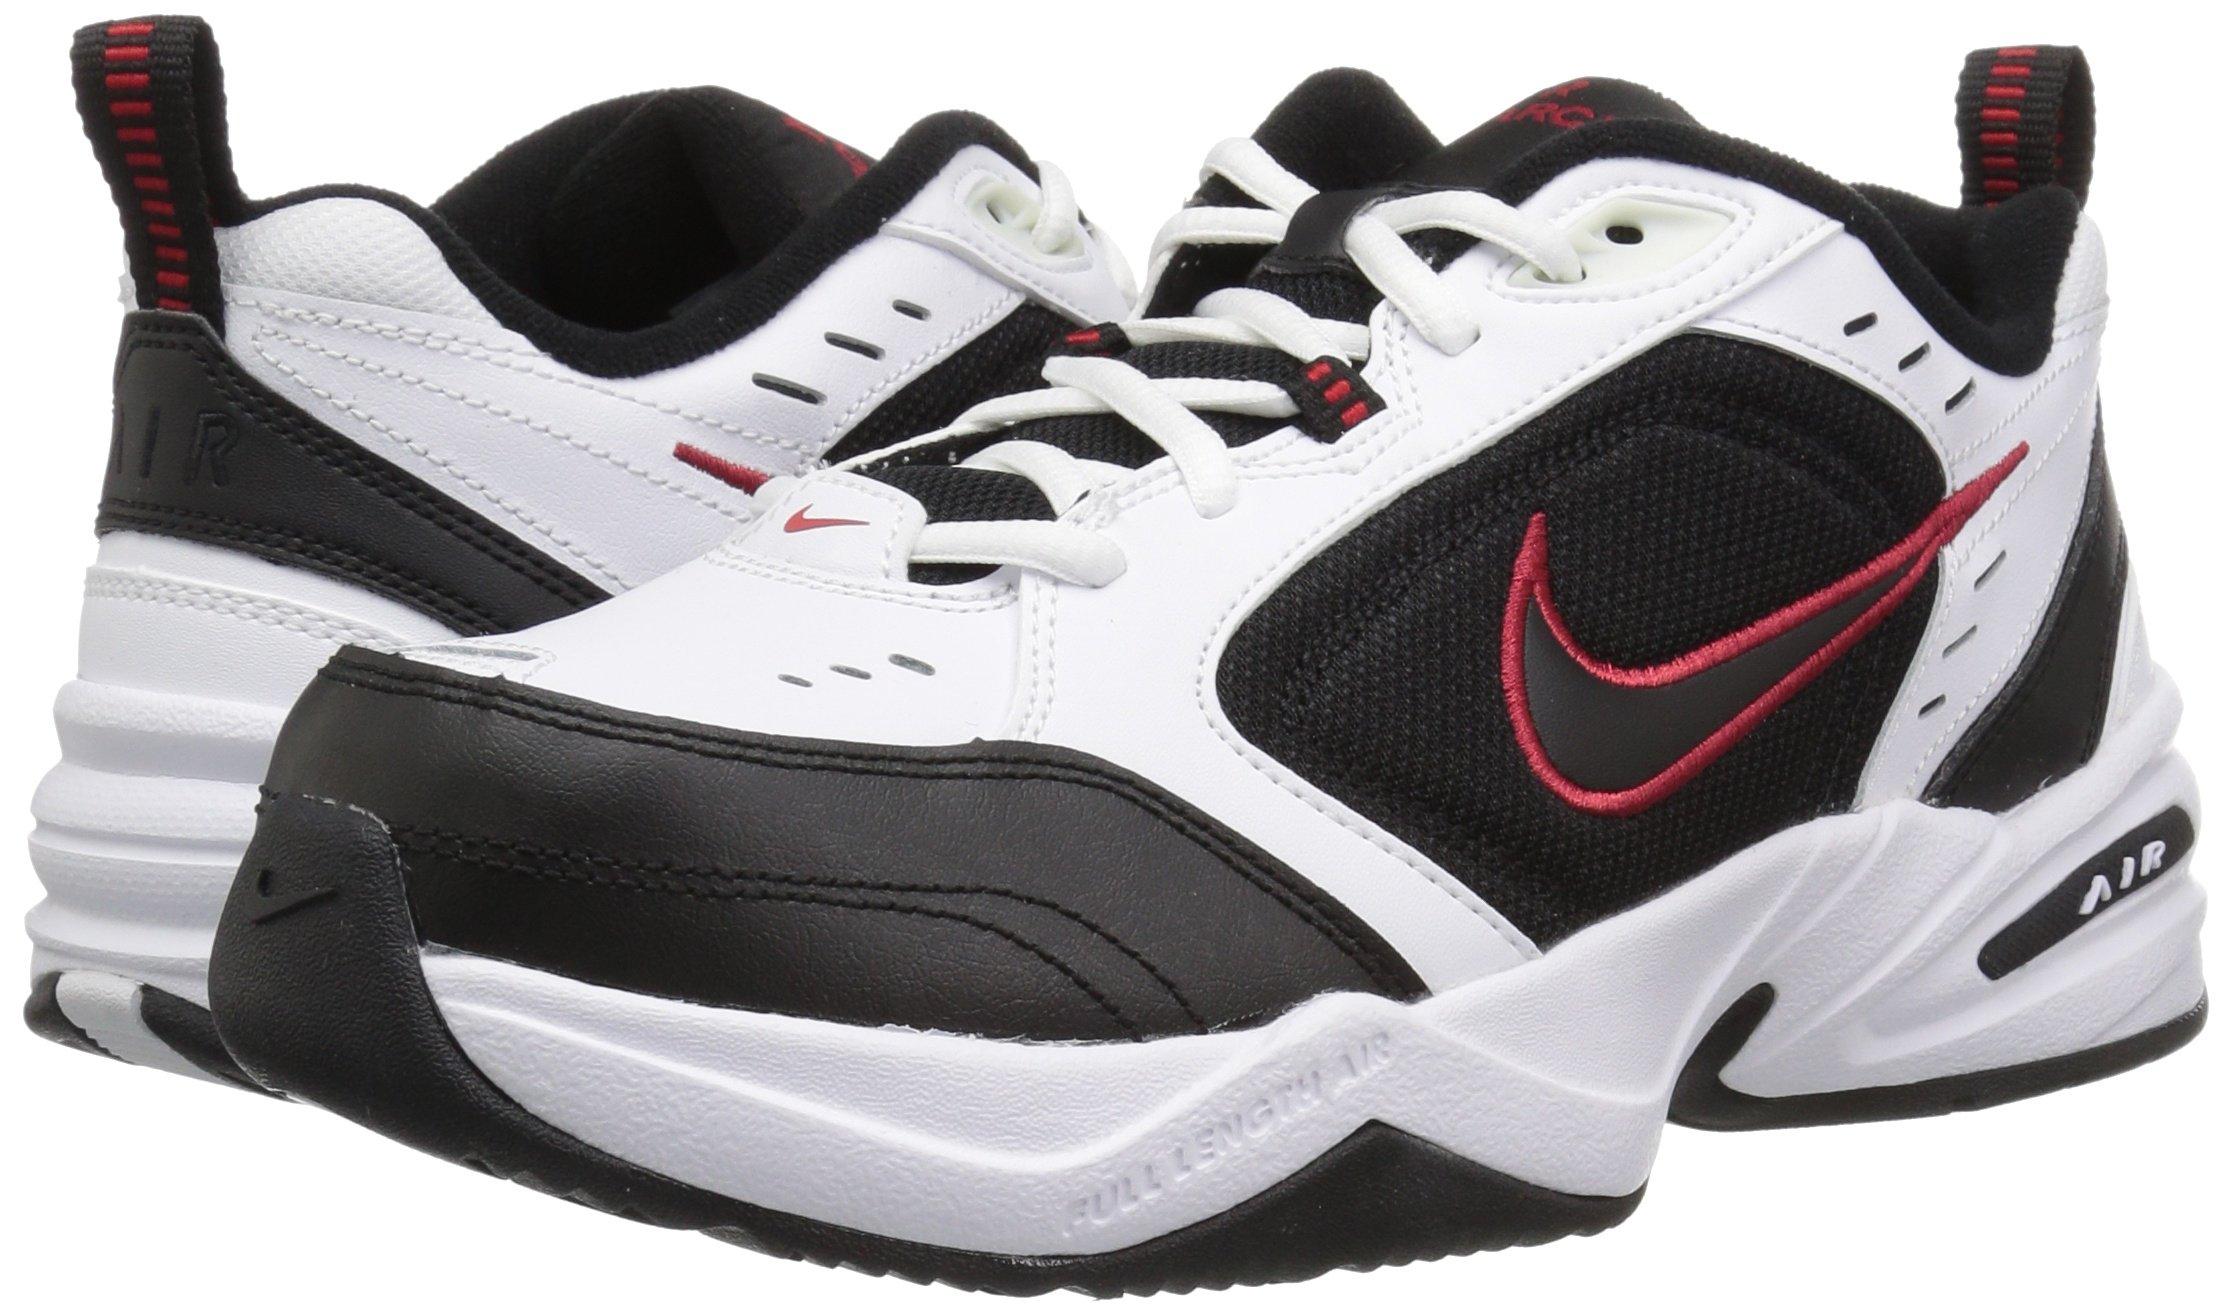 Nike Men's Air Monarch IV Cross Trainer, White/Black, 6.0 Regular US by Nike (Image #5)